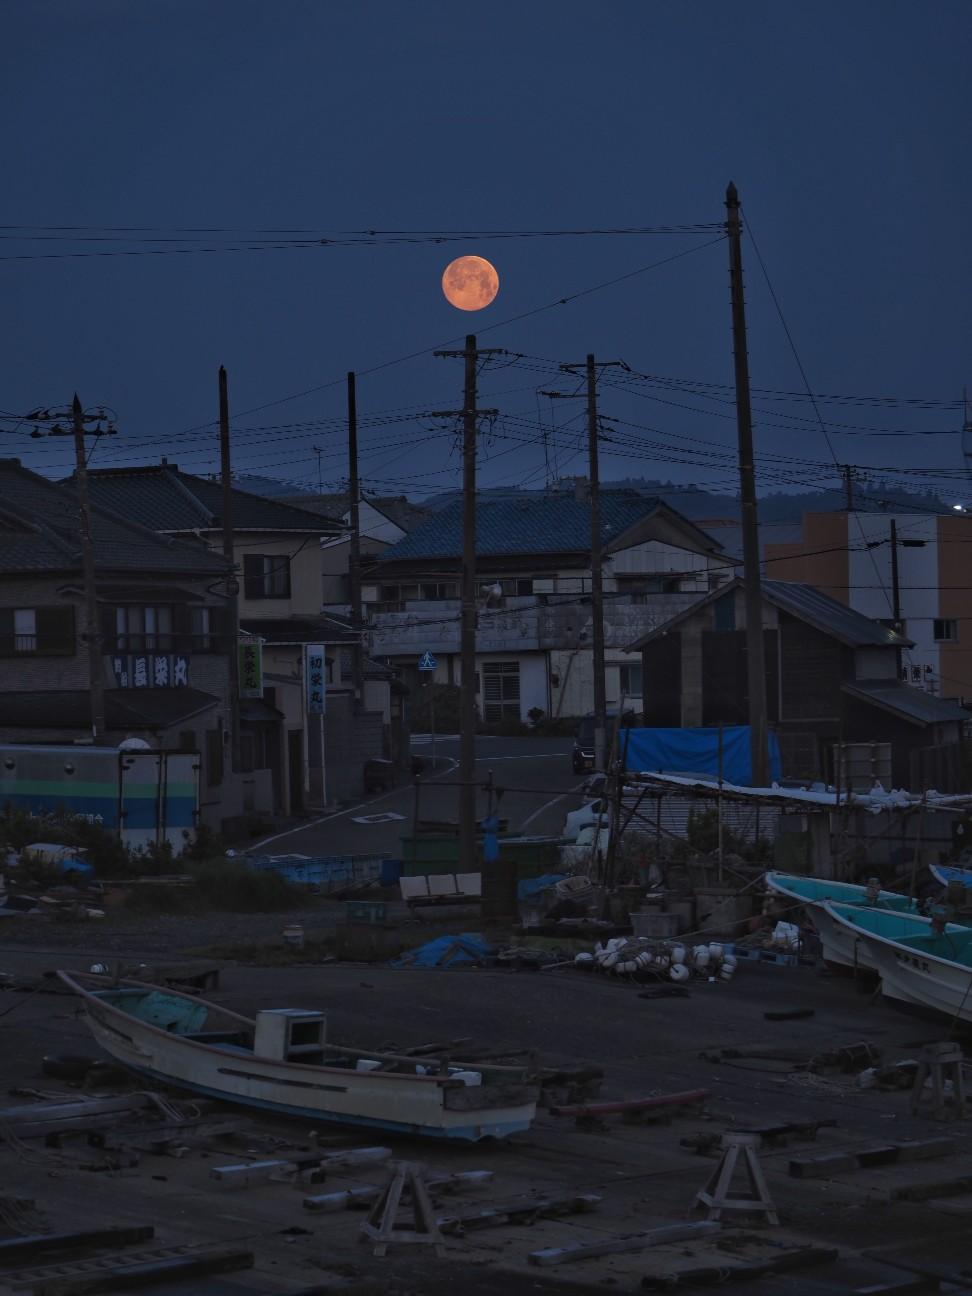 f:id:moriken-isumi:20200408165553j:image